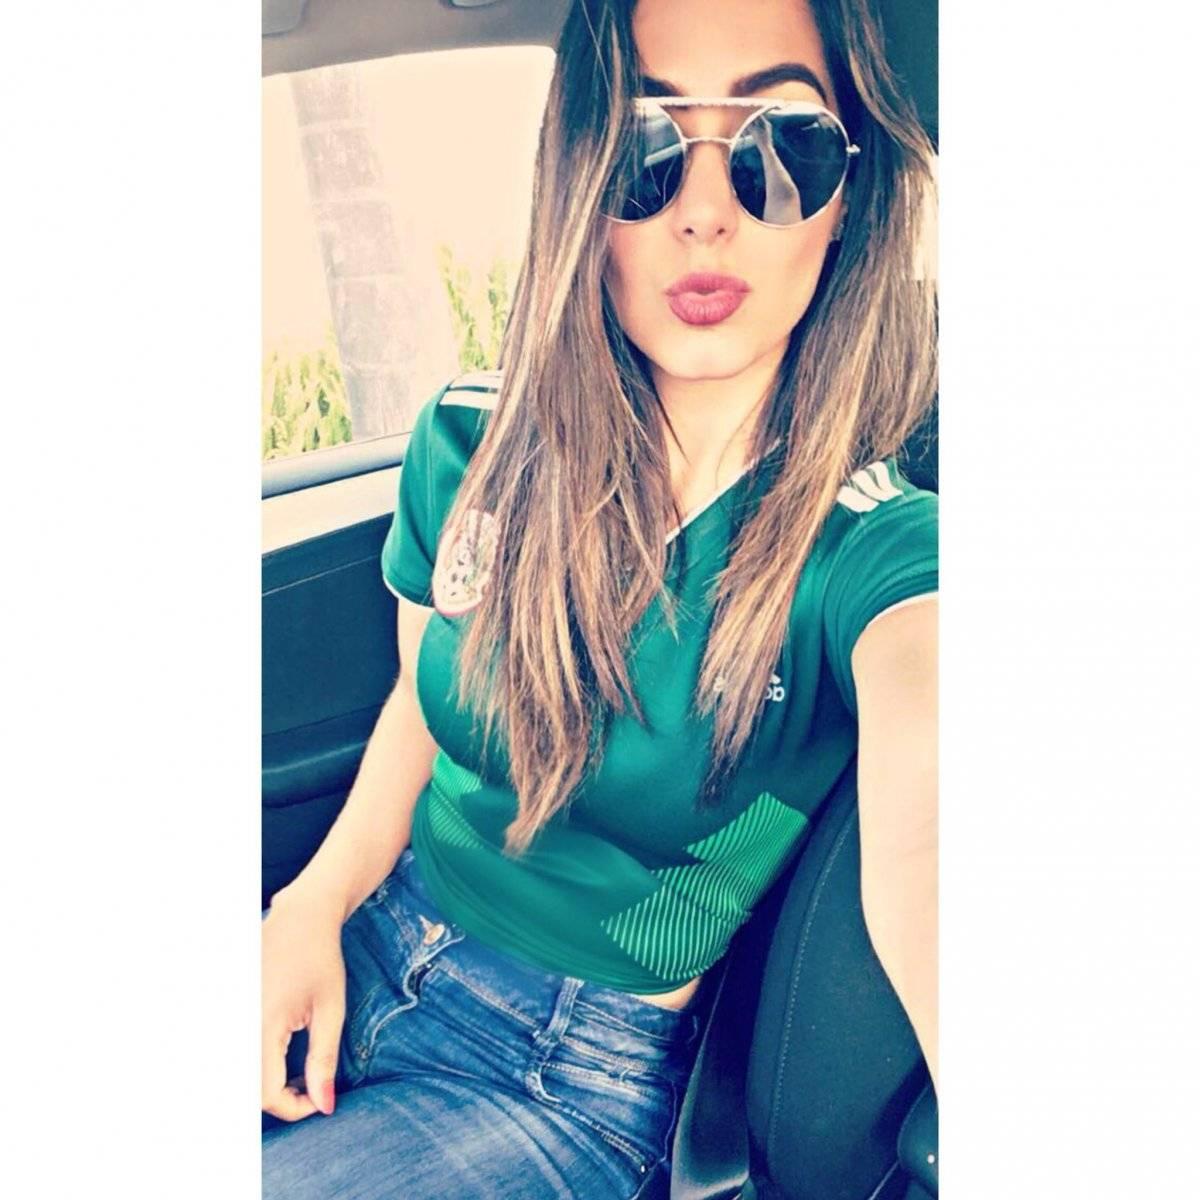 Instagram: anygallardo